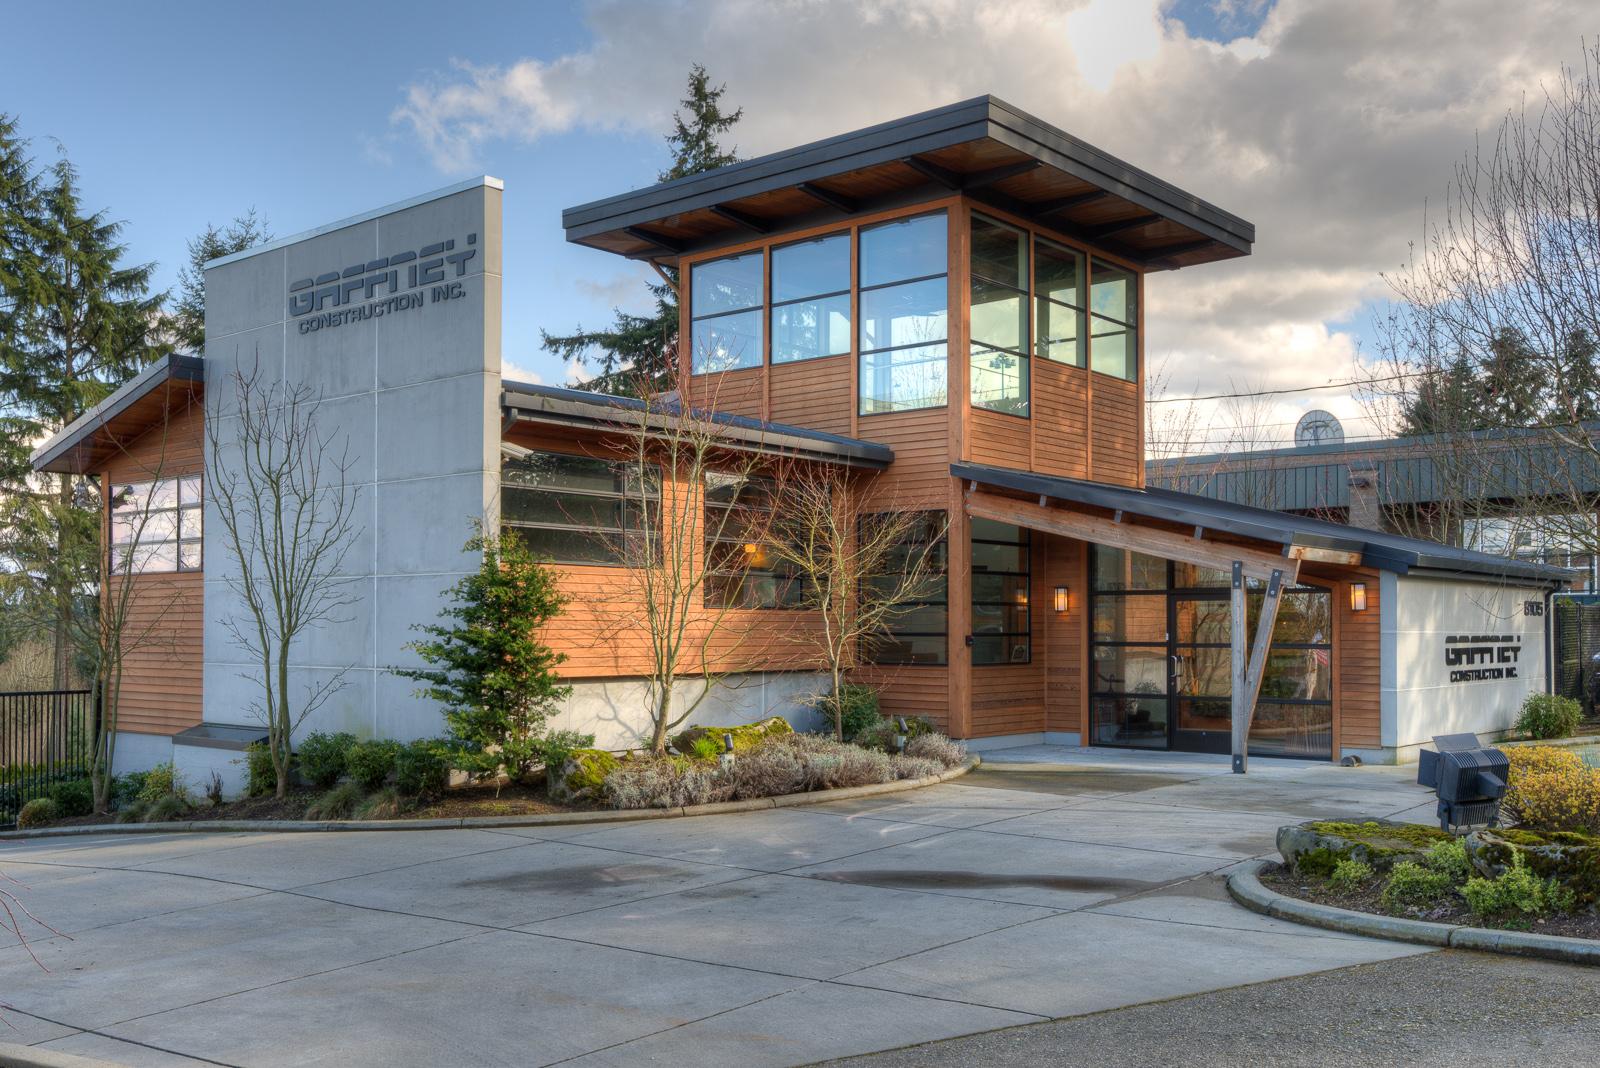 GAFFNEY CONSTRUCTION | Everett, WA